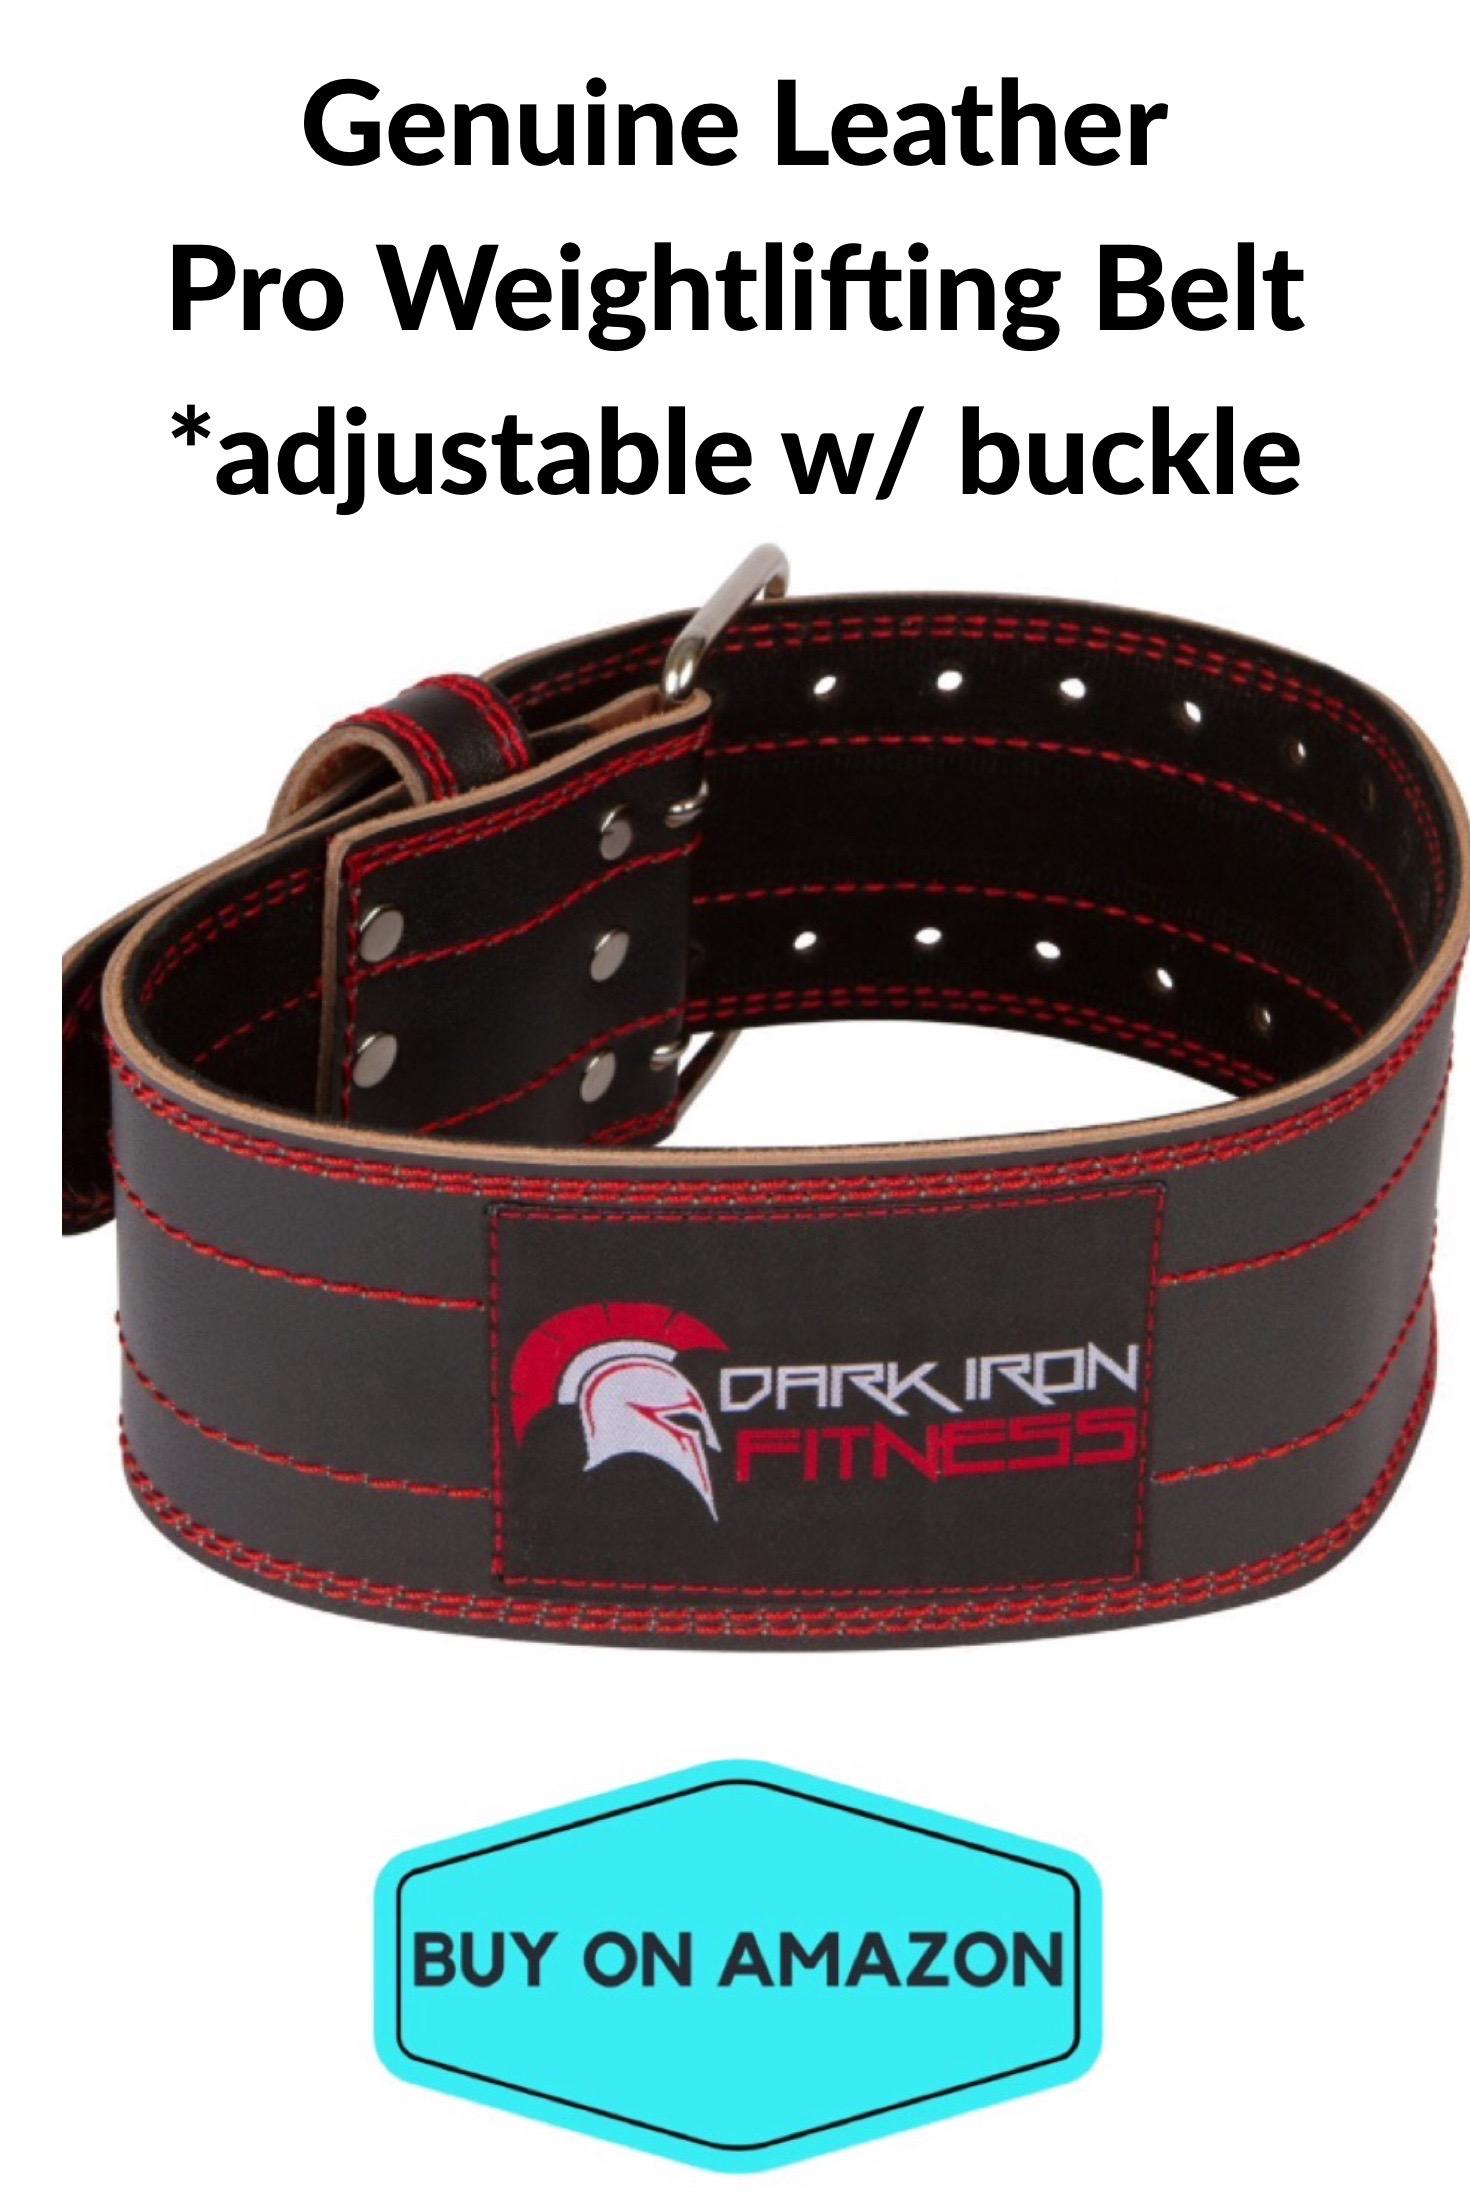 Genuine Leather Pro Weightlifting Belt